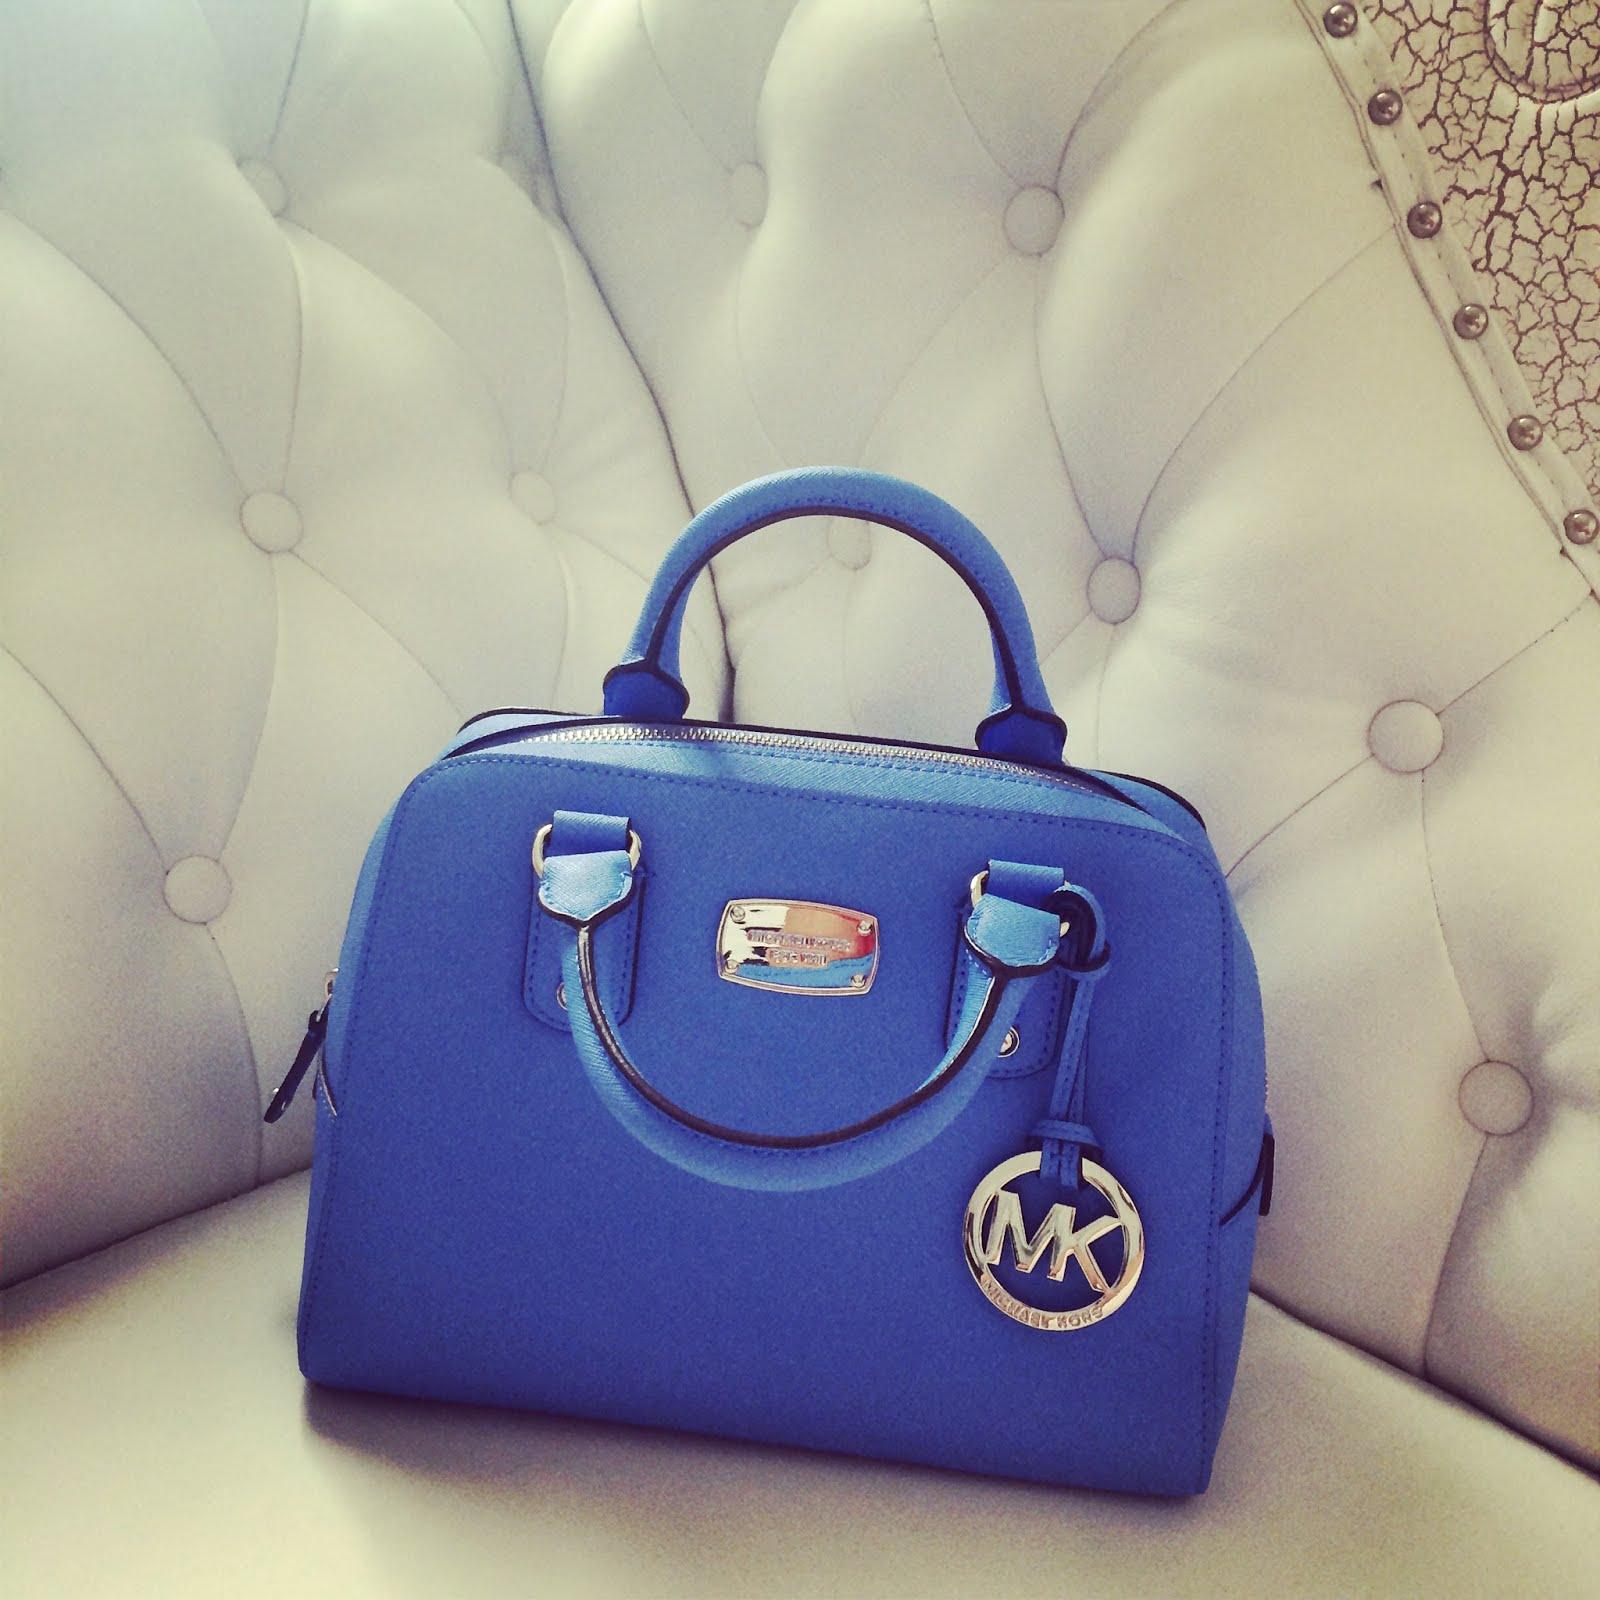 Michael kors bags in dubai - Michael Kors Women Sungles Uae Best S Michael Kors Small Satchel Luggage Blue